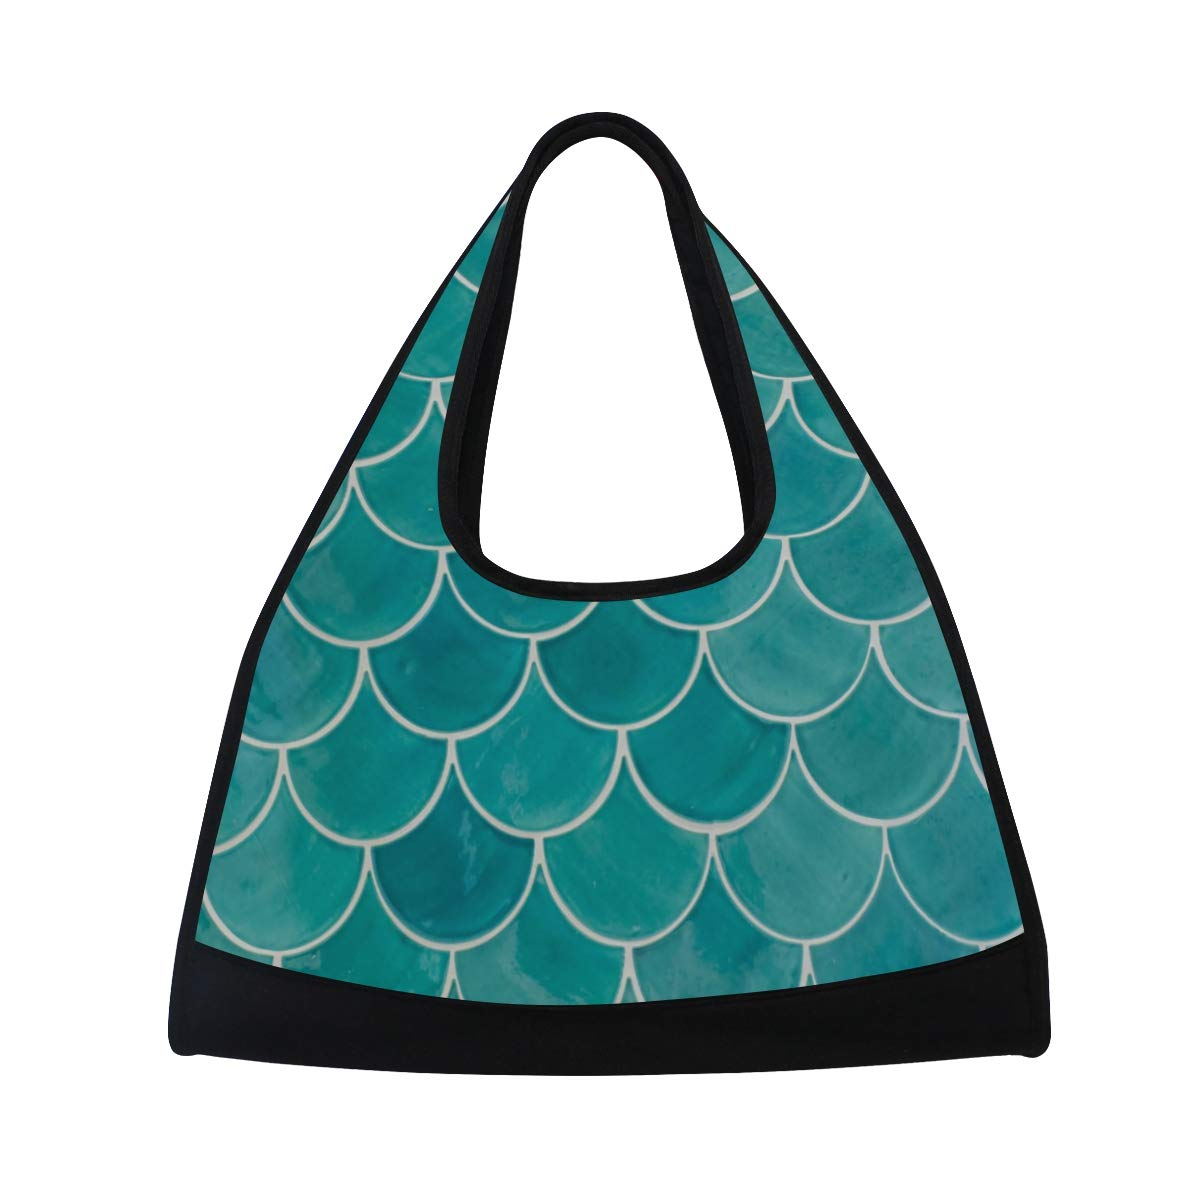 Mermaid Blue Fish Scales Women Sports Gym Totes Bag Multi-Function Nylon Travel Shoulder Bag